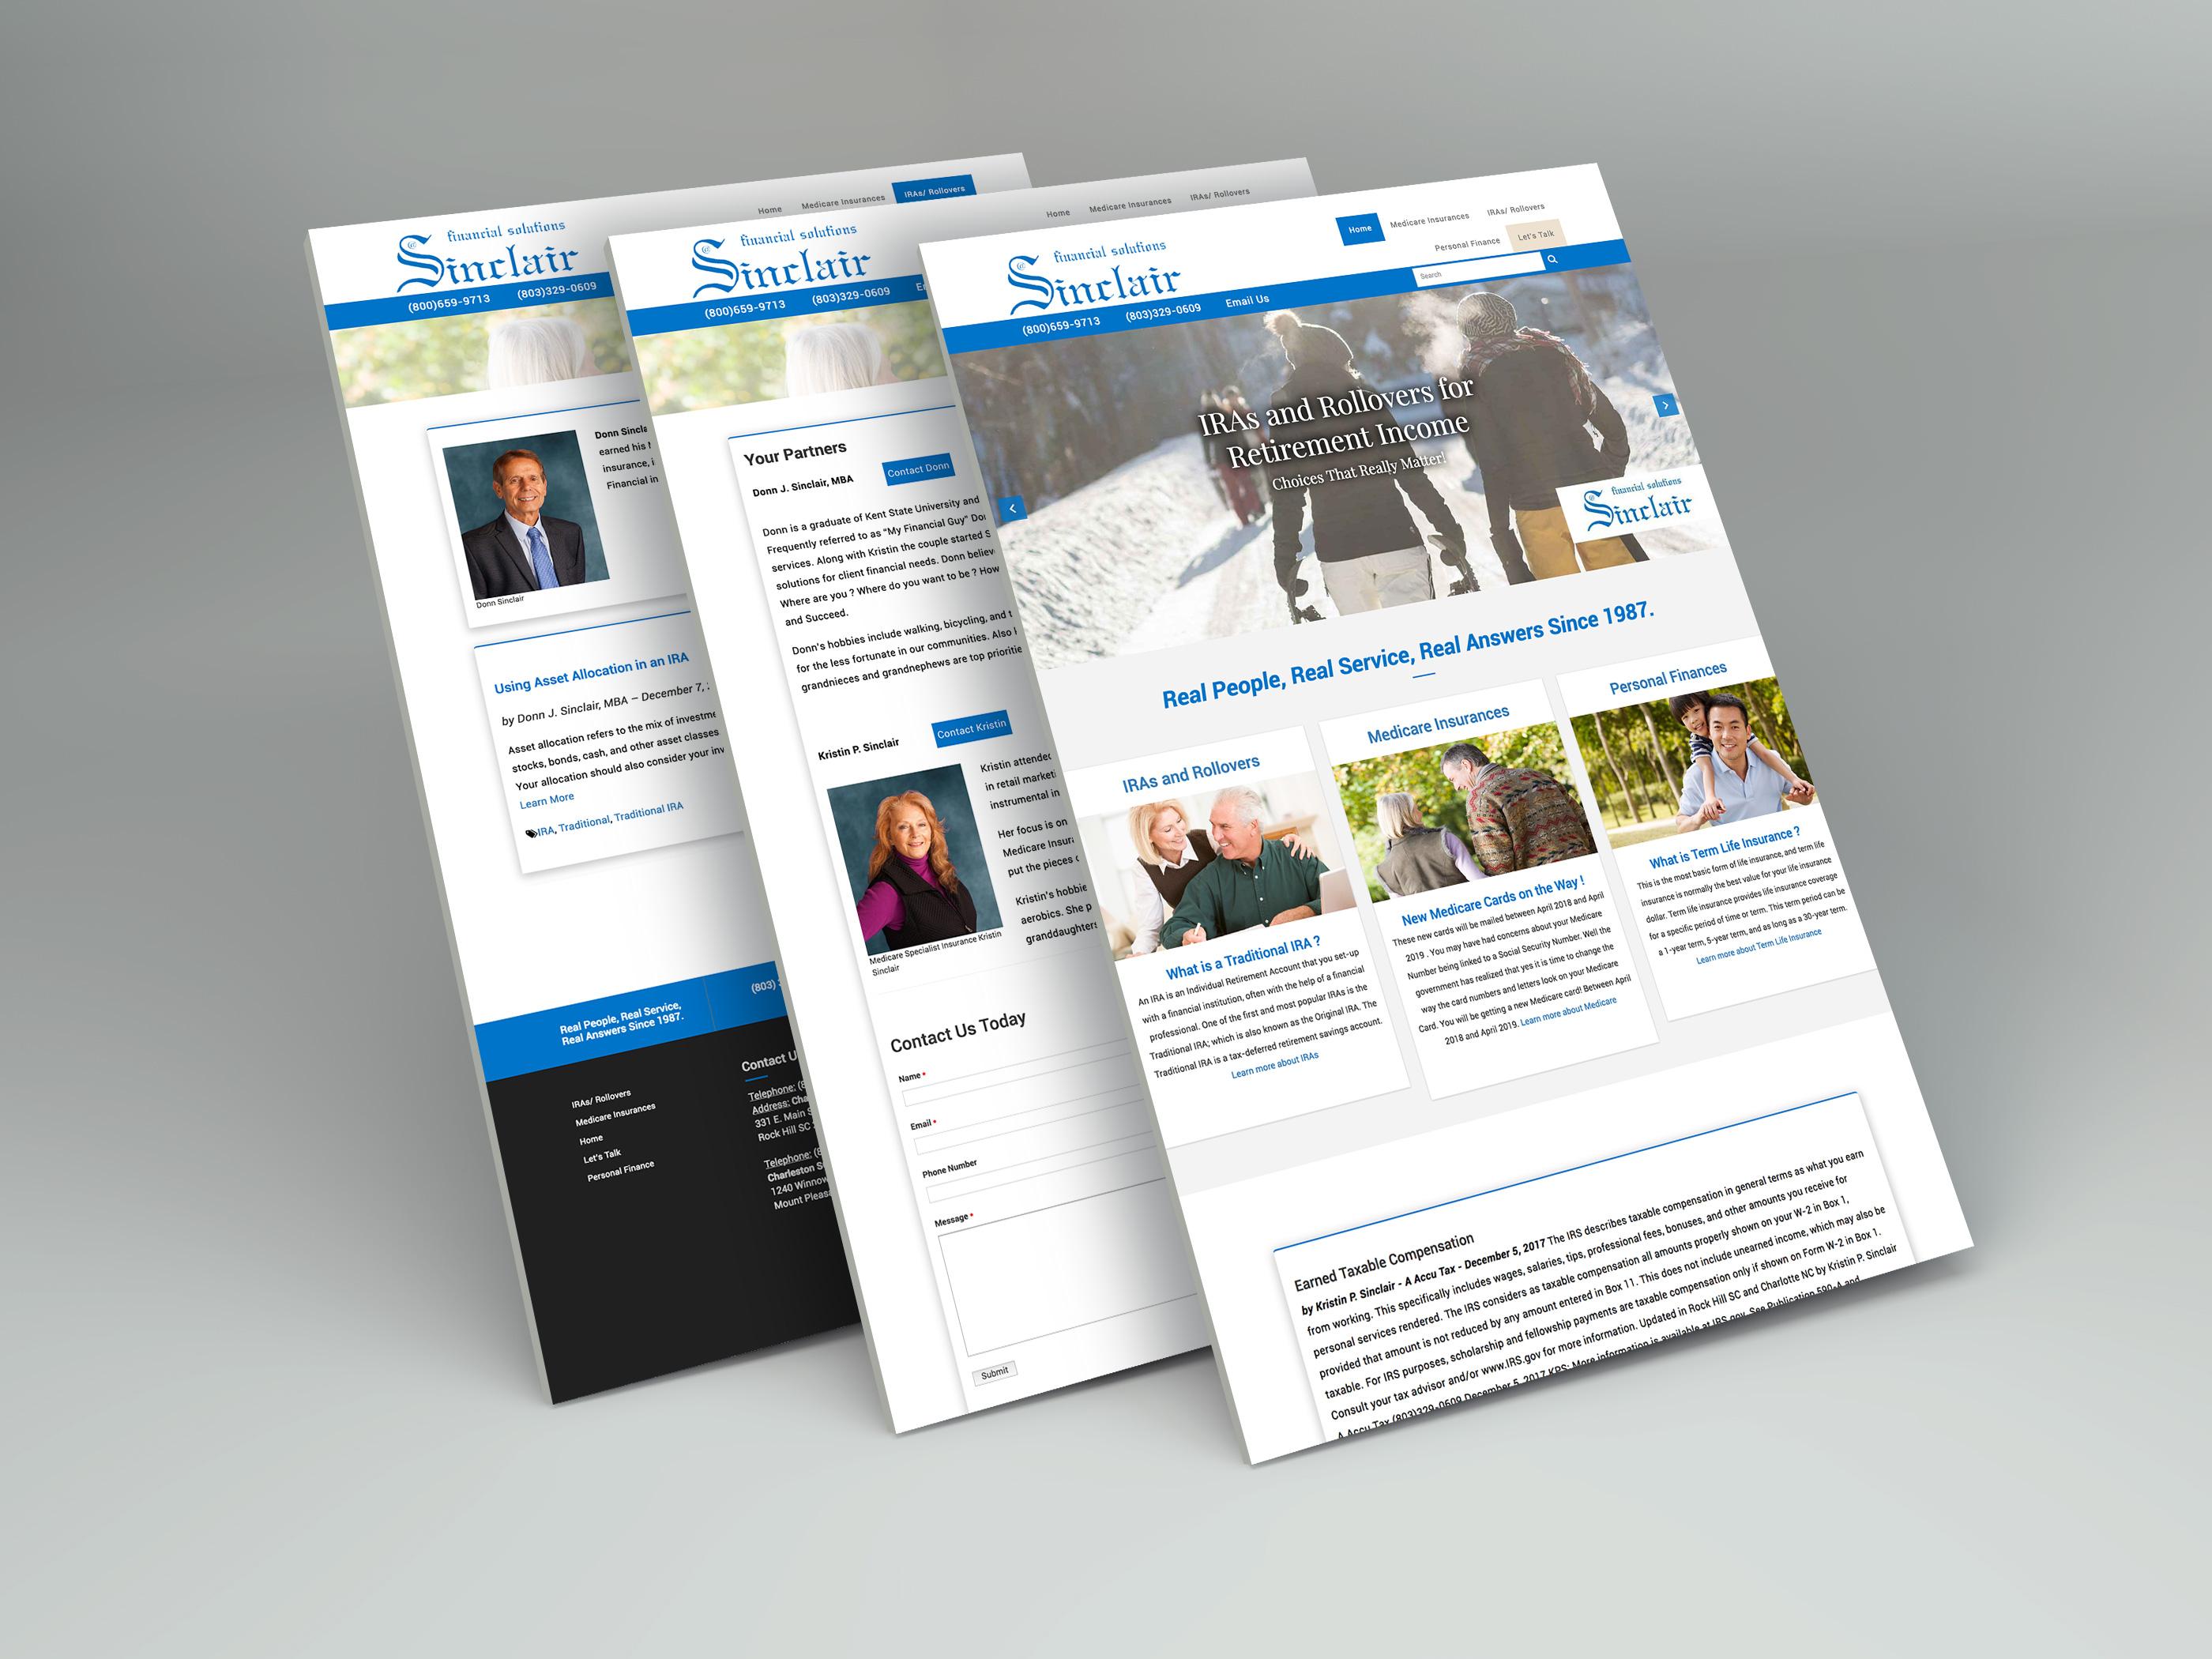 Sinclair Financial Solutions Website